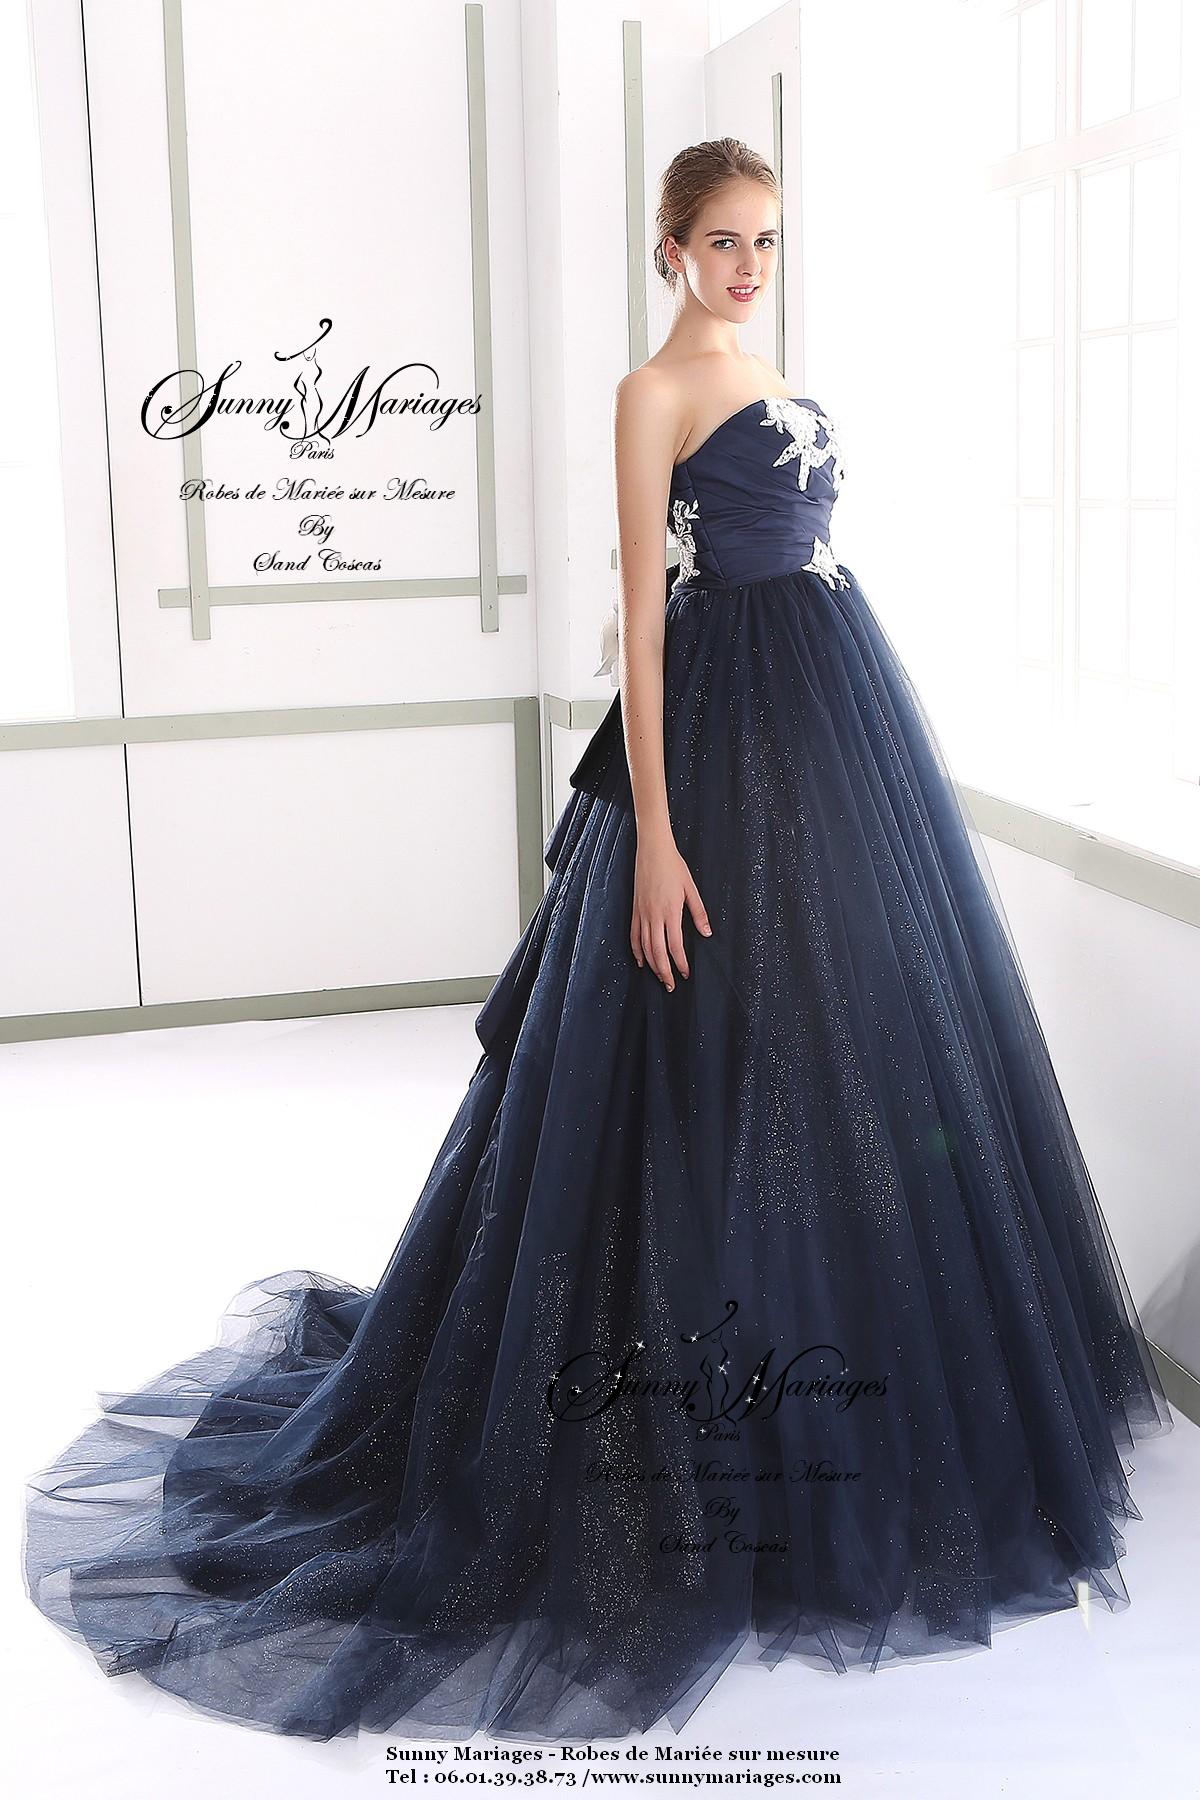 De Princesse MesureSunny Mariage Sur Robe Noire Mariée b7yIfmY6gv